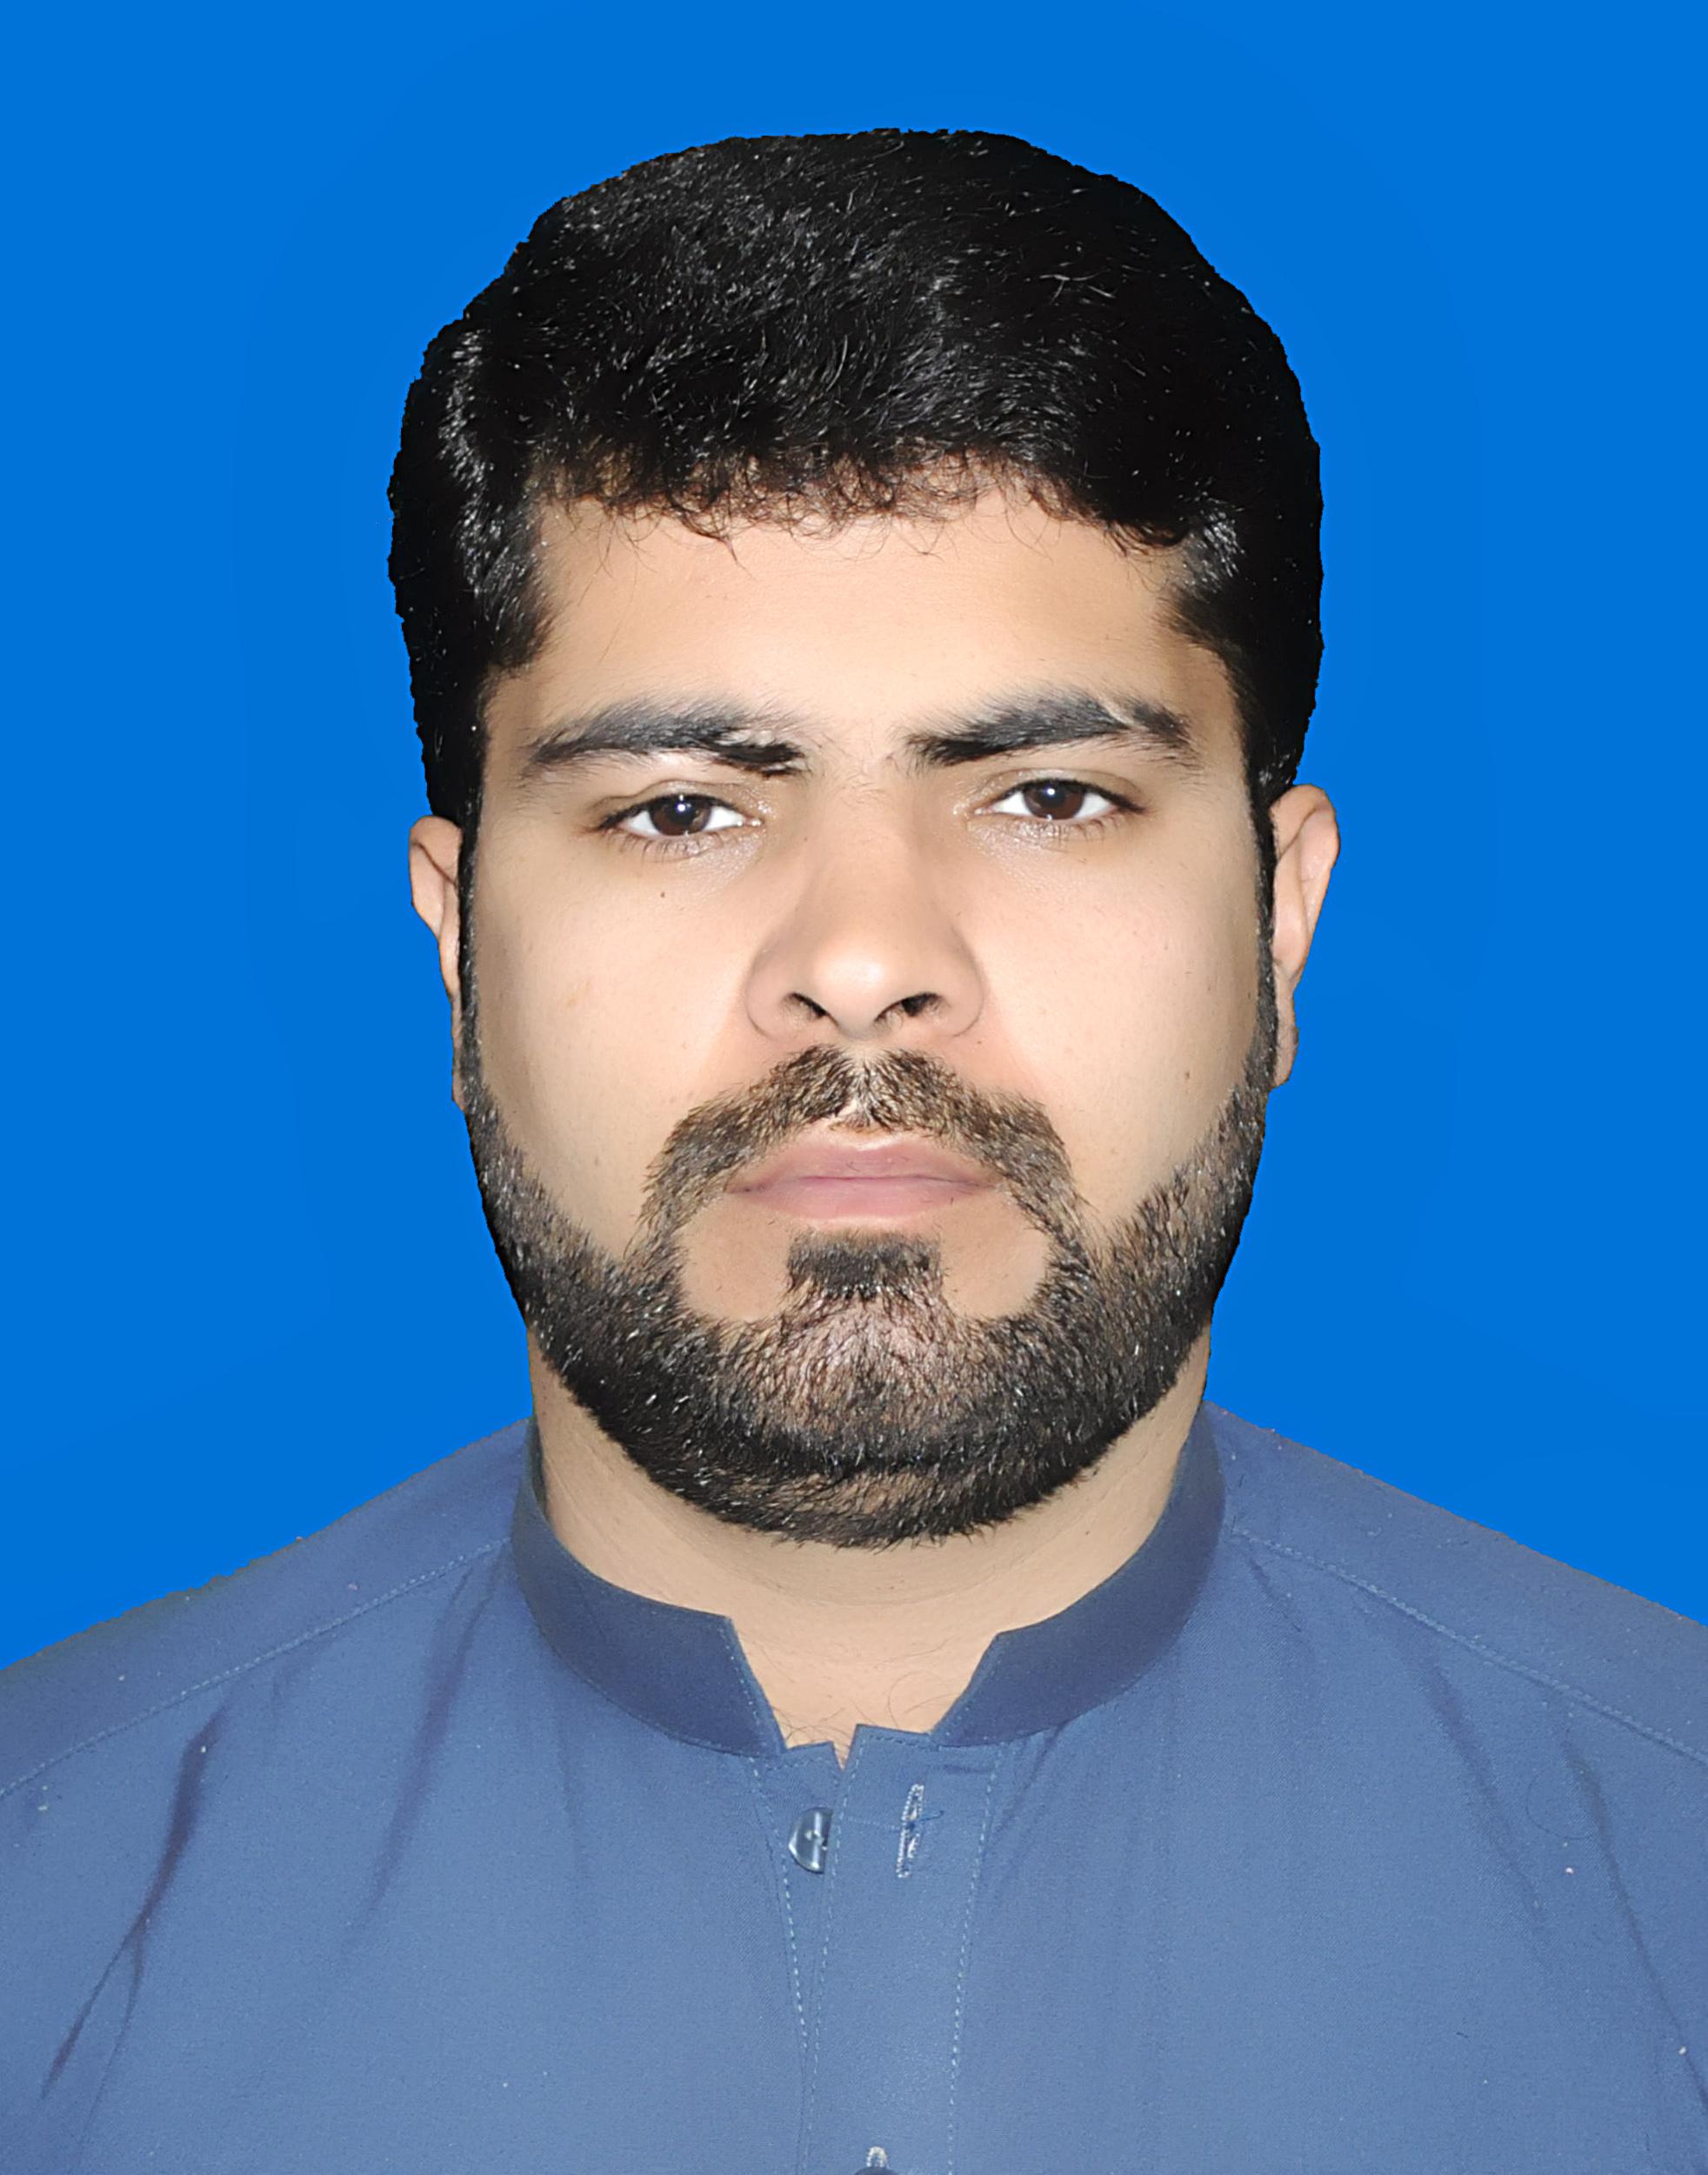 Majid khan